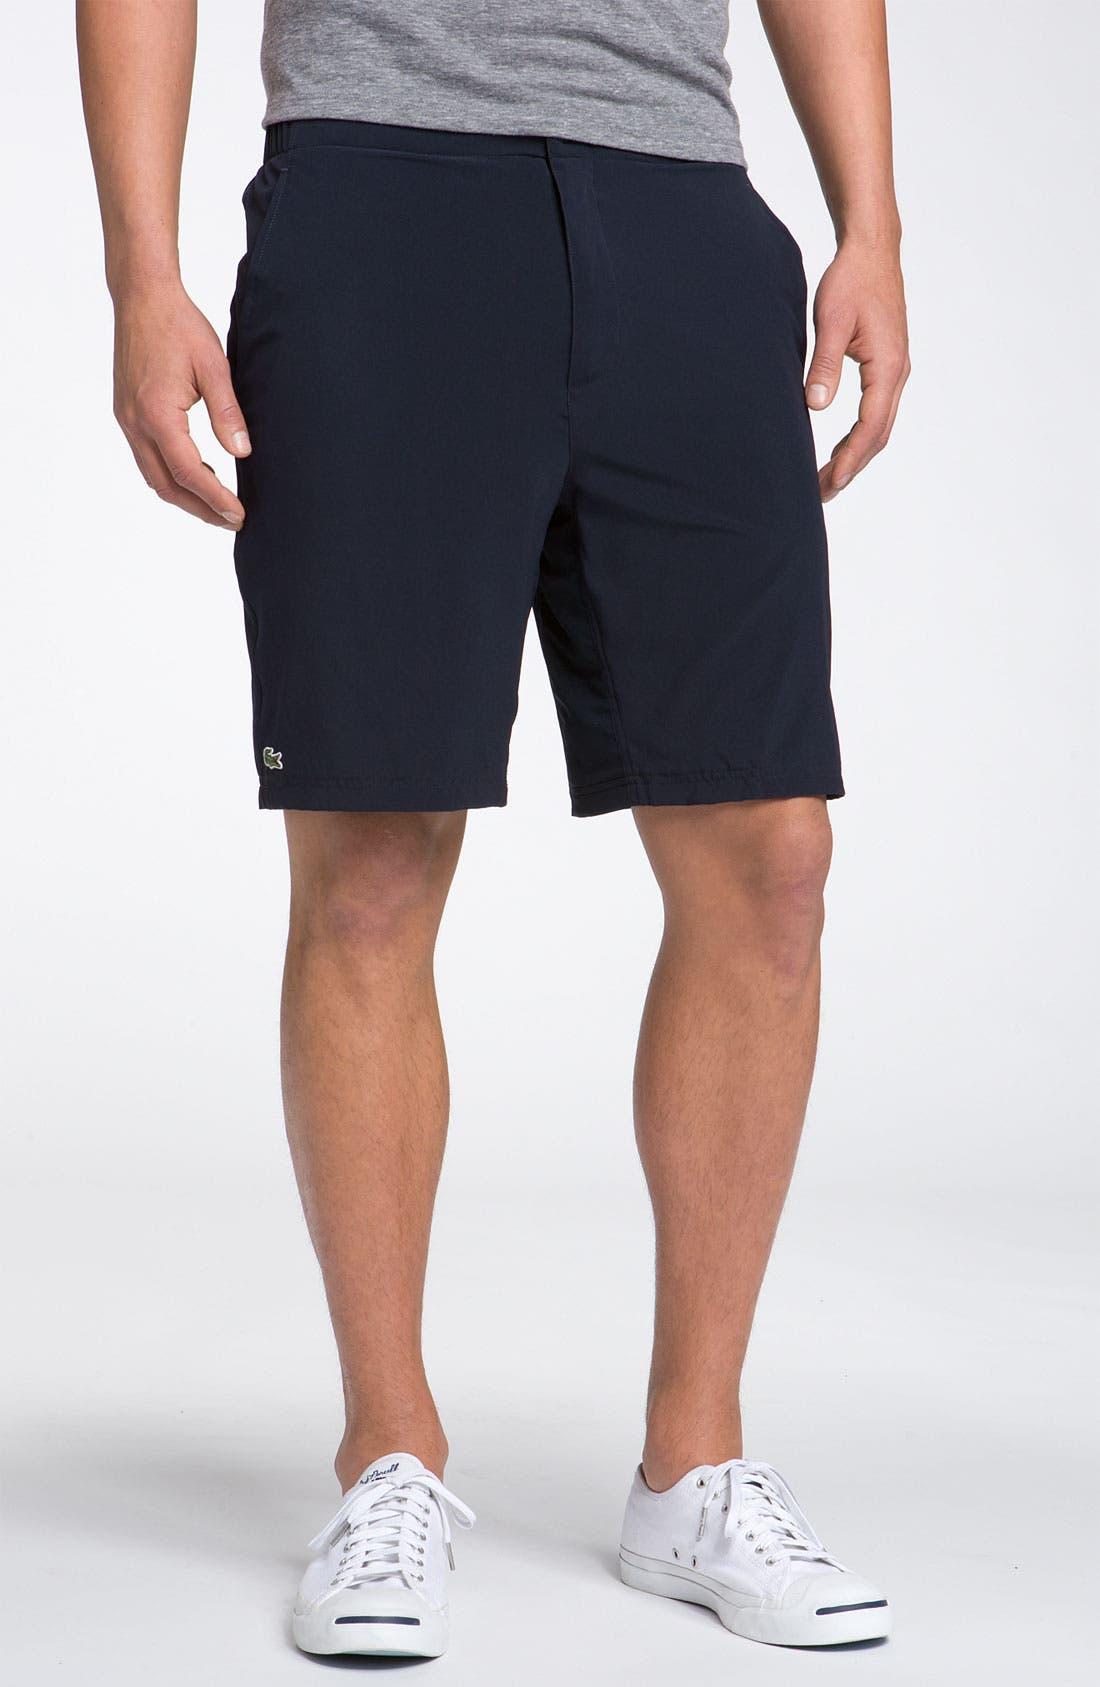 Alternate Image 1 Selected - Lacoste Taffeta Tennis Shorts